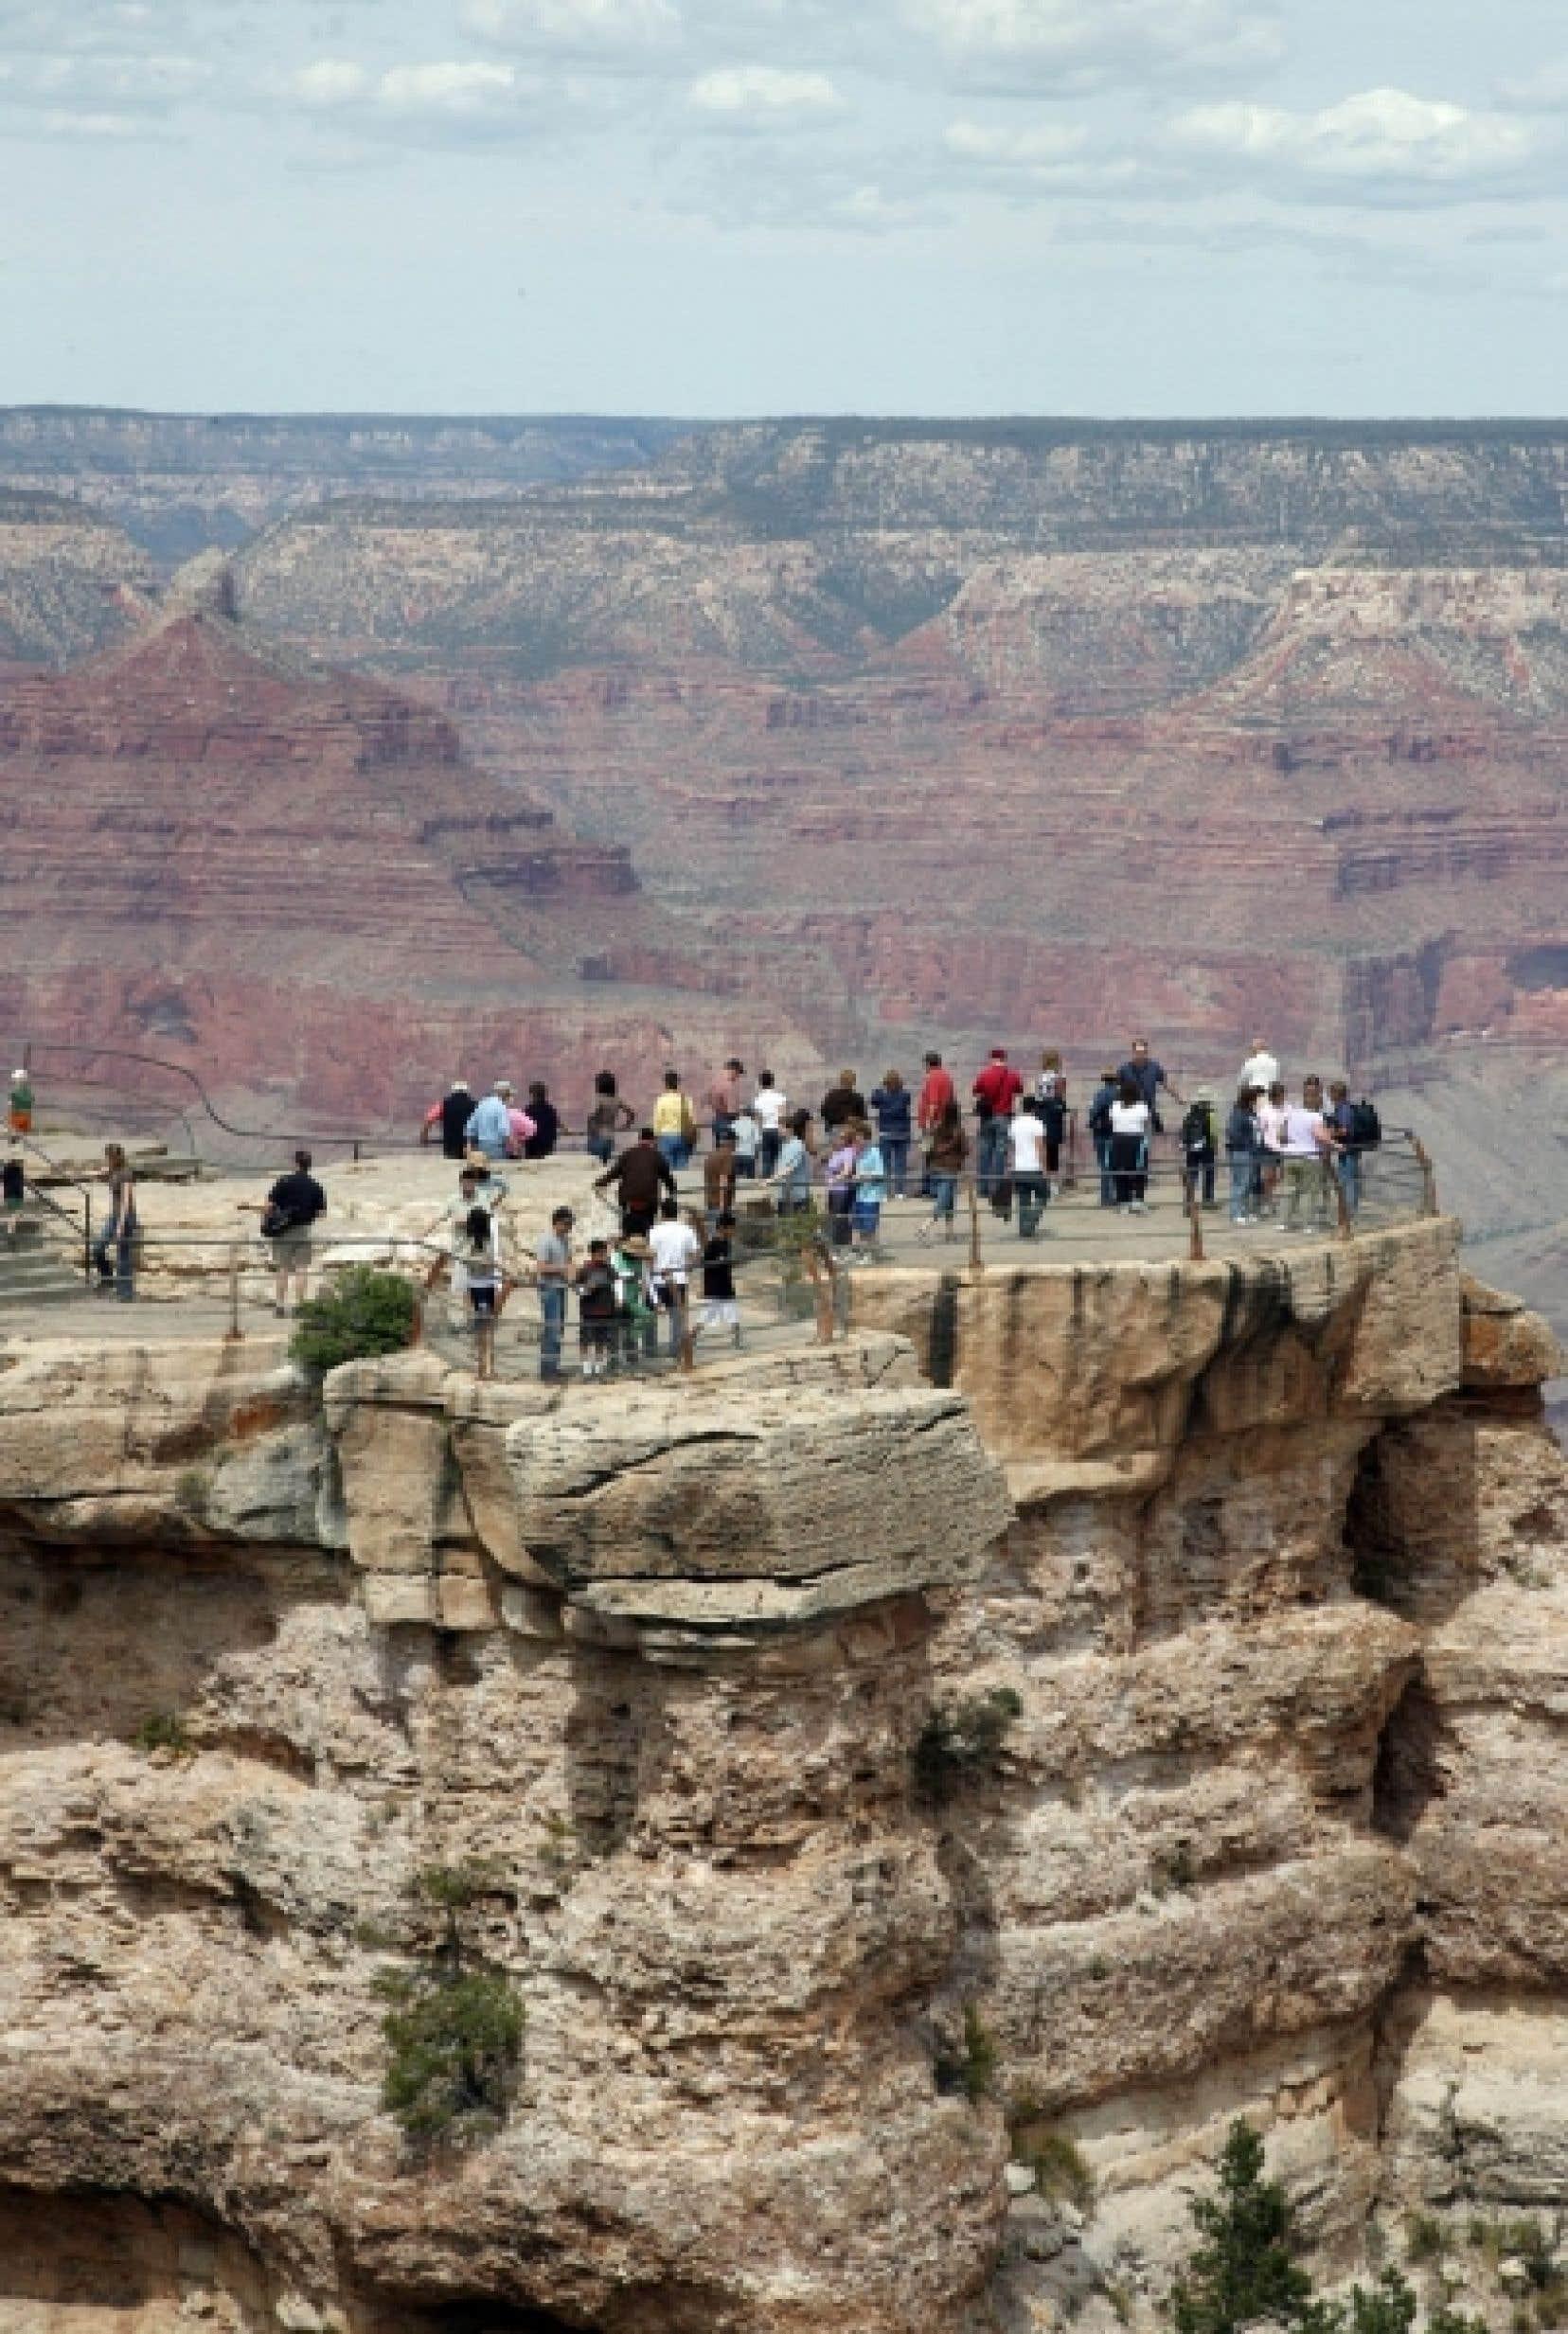 Une vue du Grand Canyon, en Arizona, long de quelque 450 kilomètres.